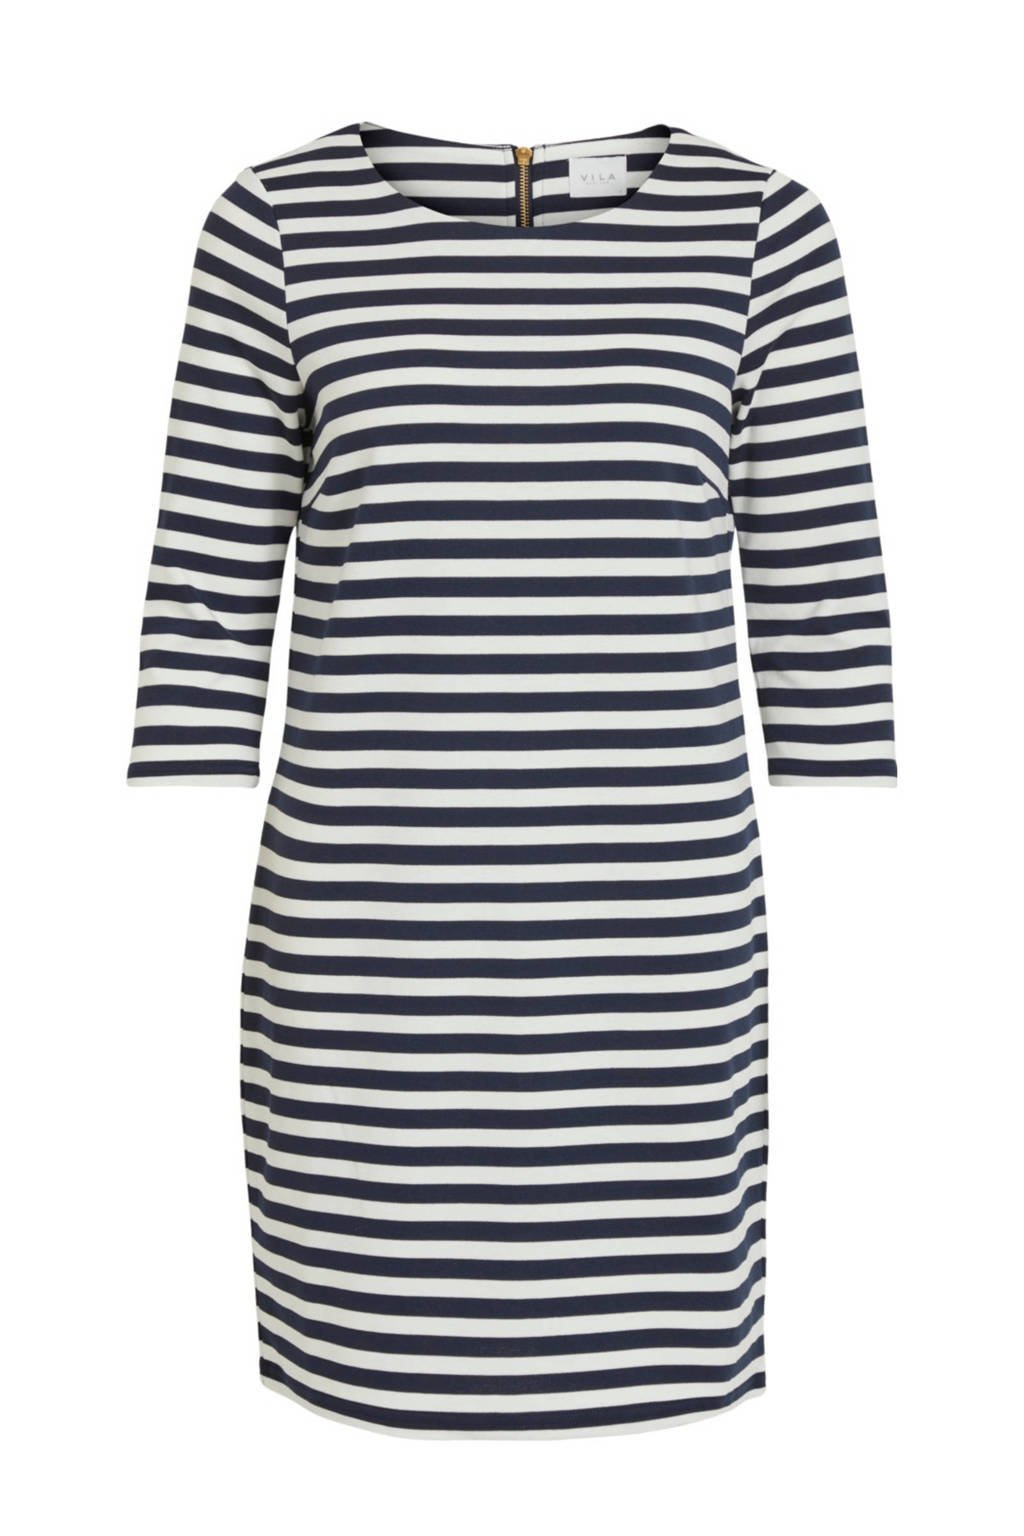 VILA jurk, Donkerblauw/wit